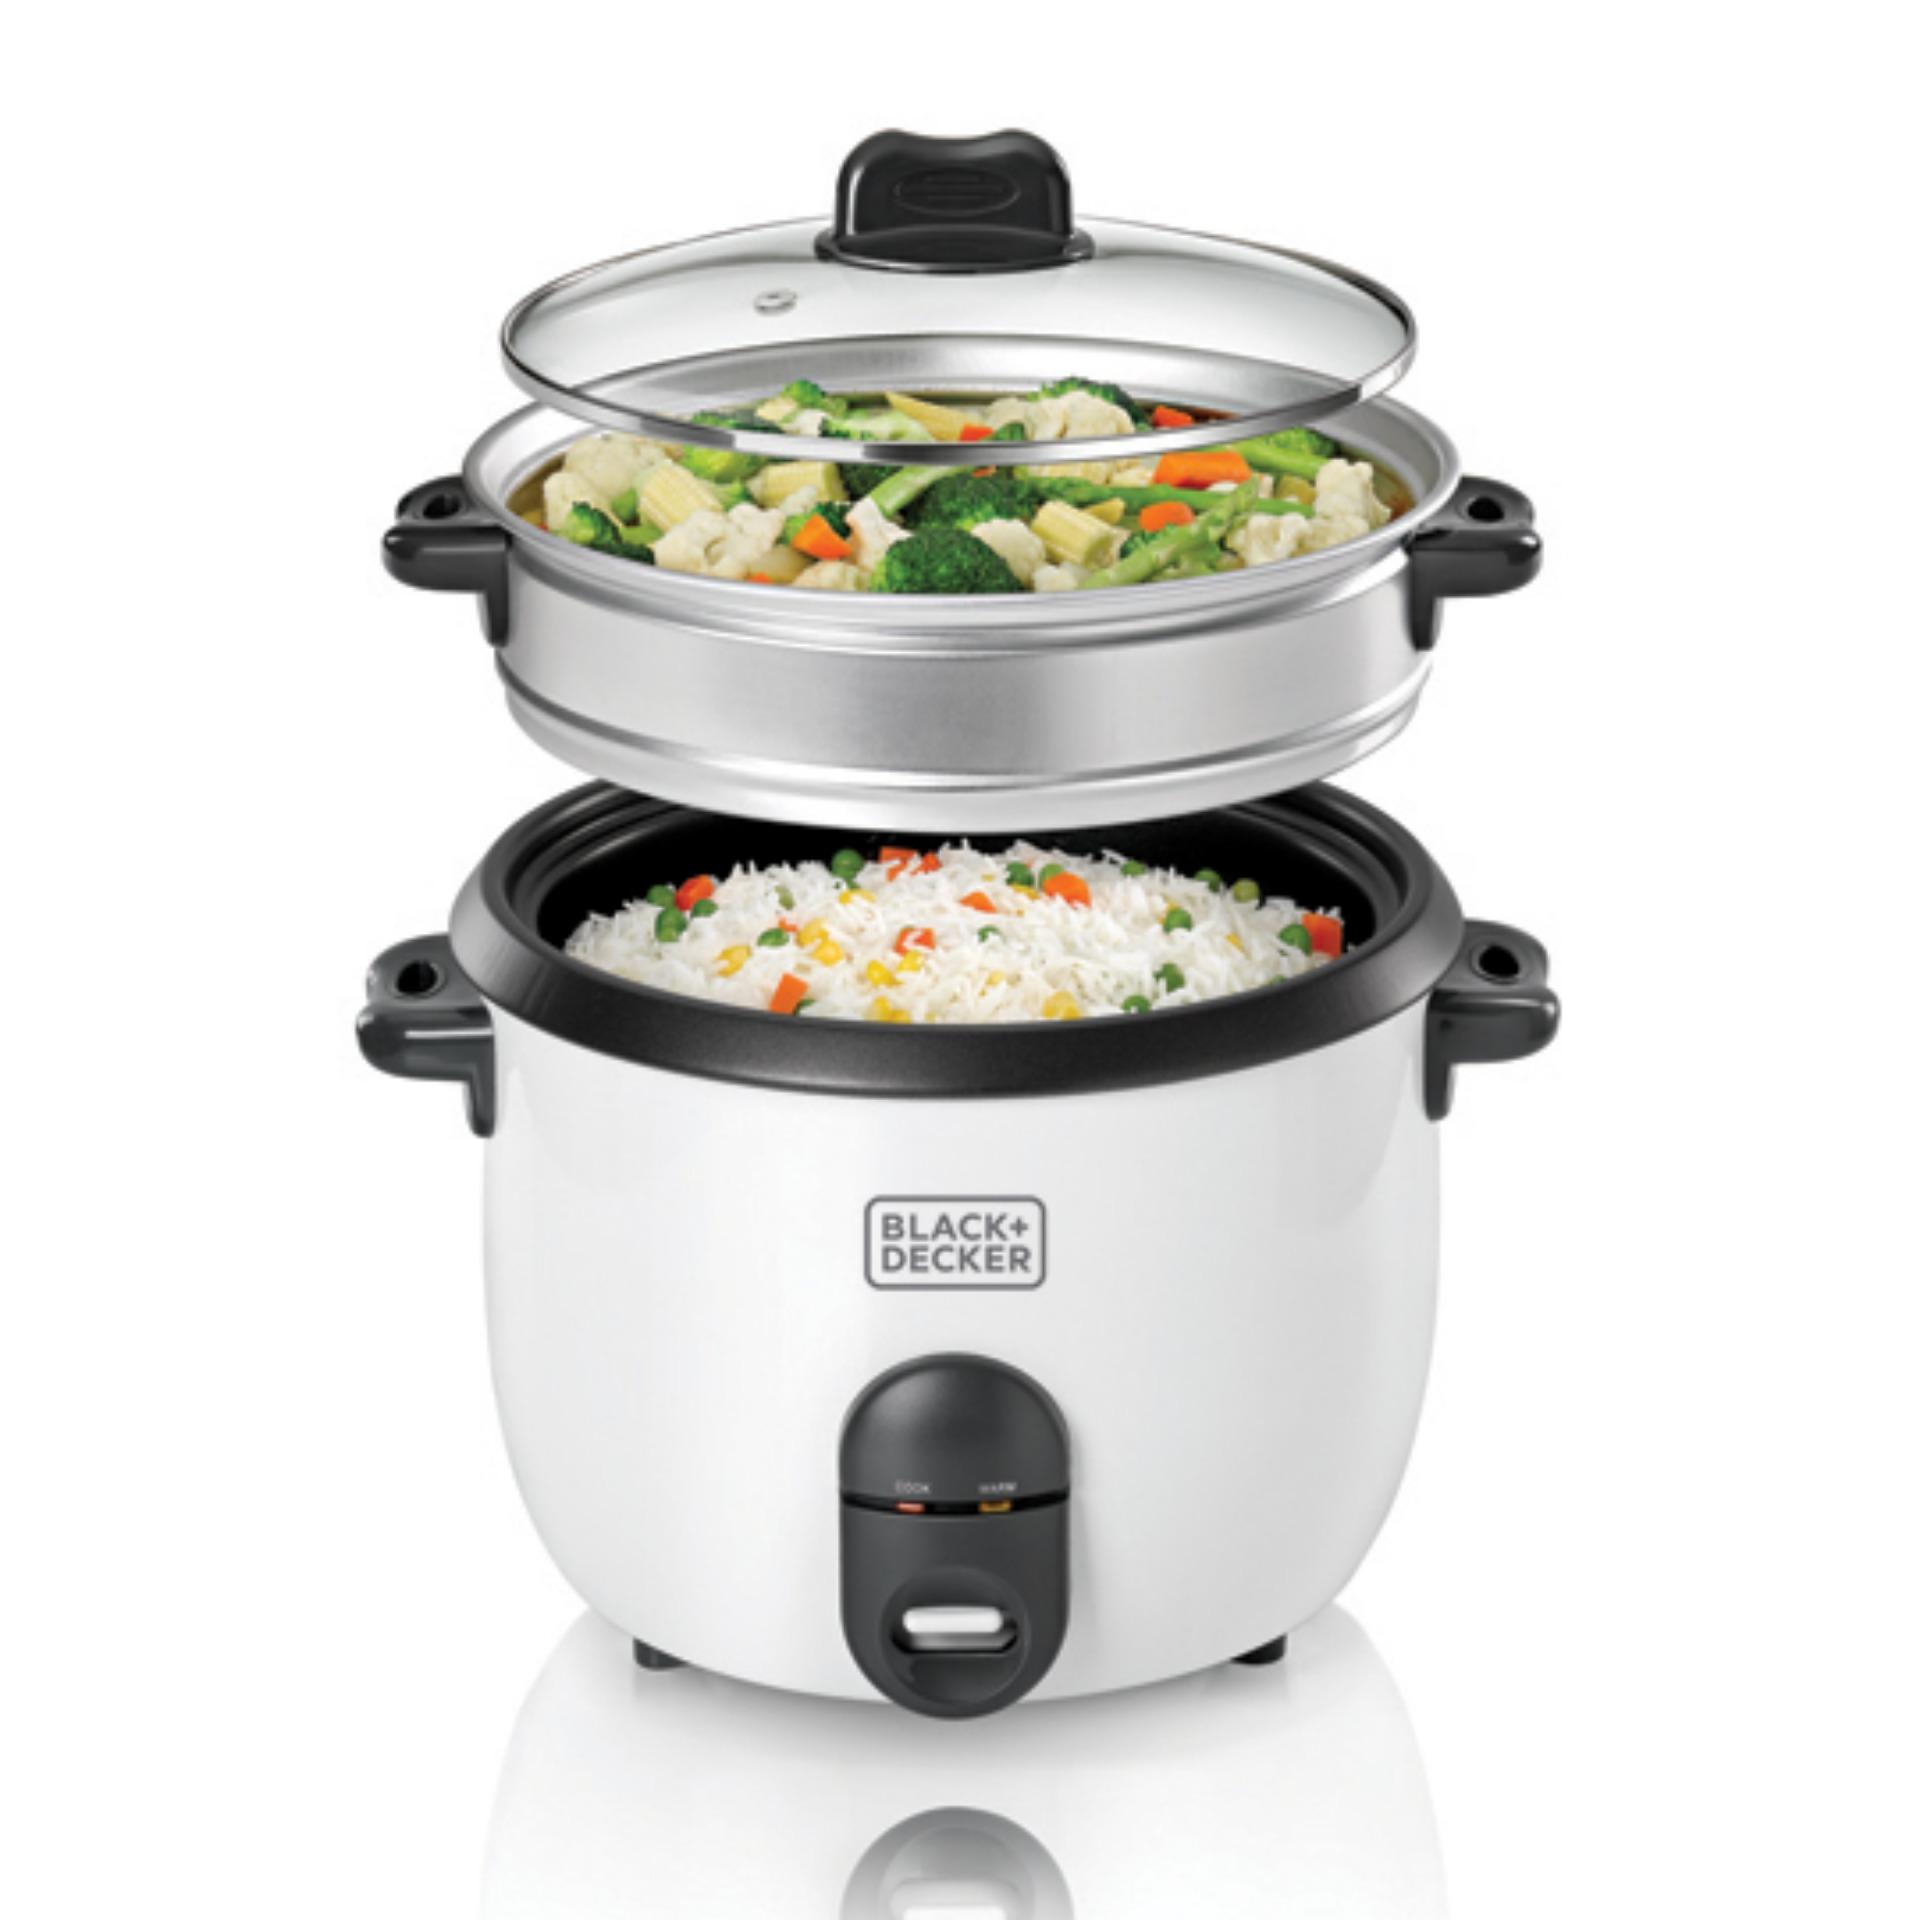 Black & Decker Automatic Rice Cooker RC1860(Garansi resmi black&decker)-putih